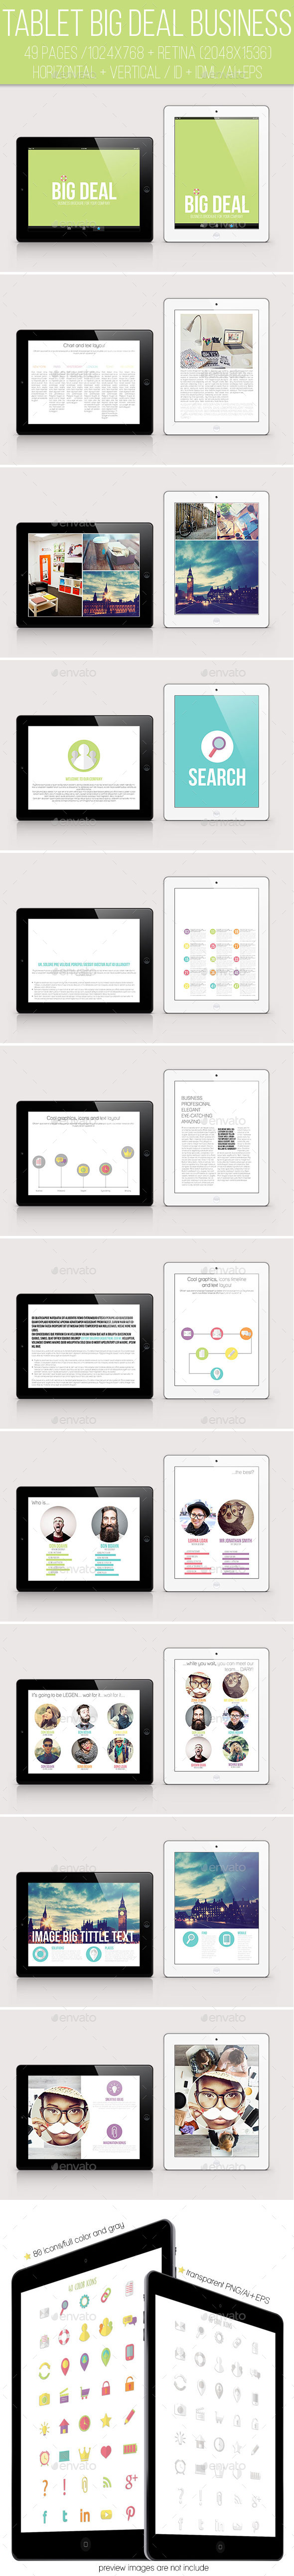 iPad &Tablet Big Deal Business Magazine - Digital Magazines ePublishing